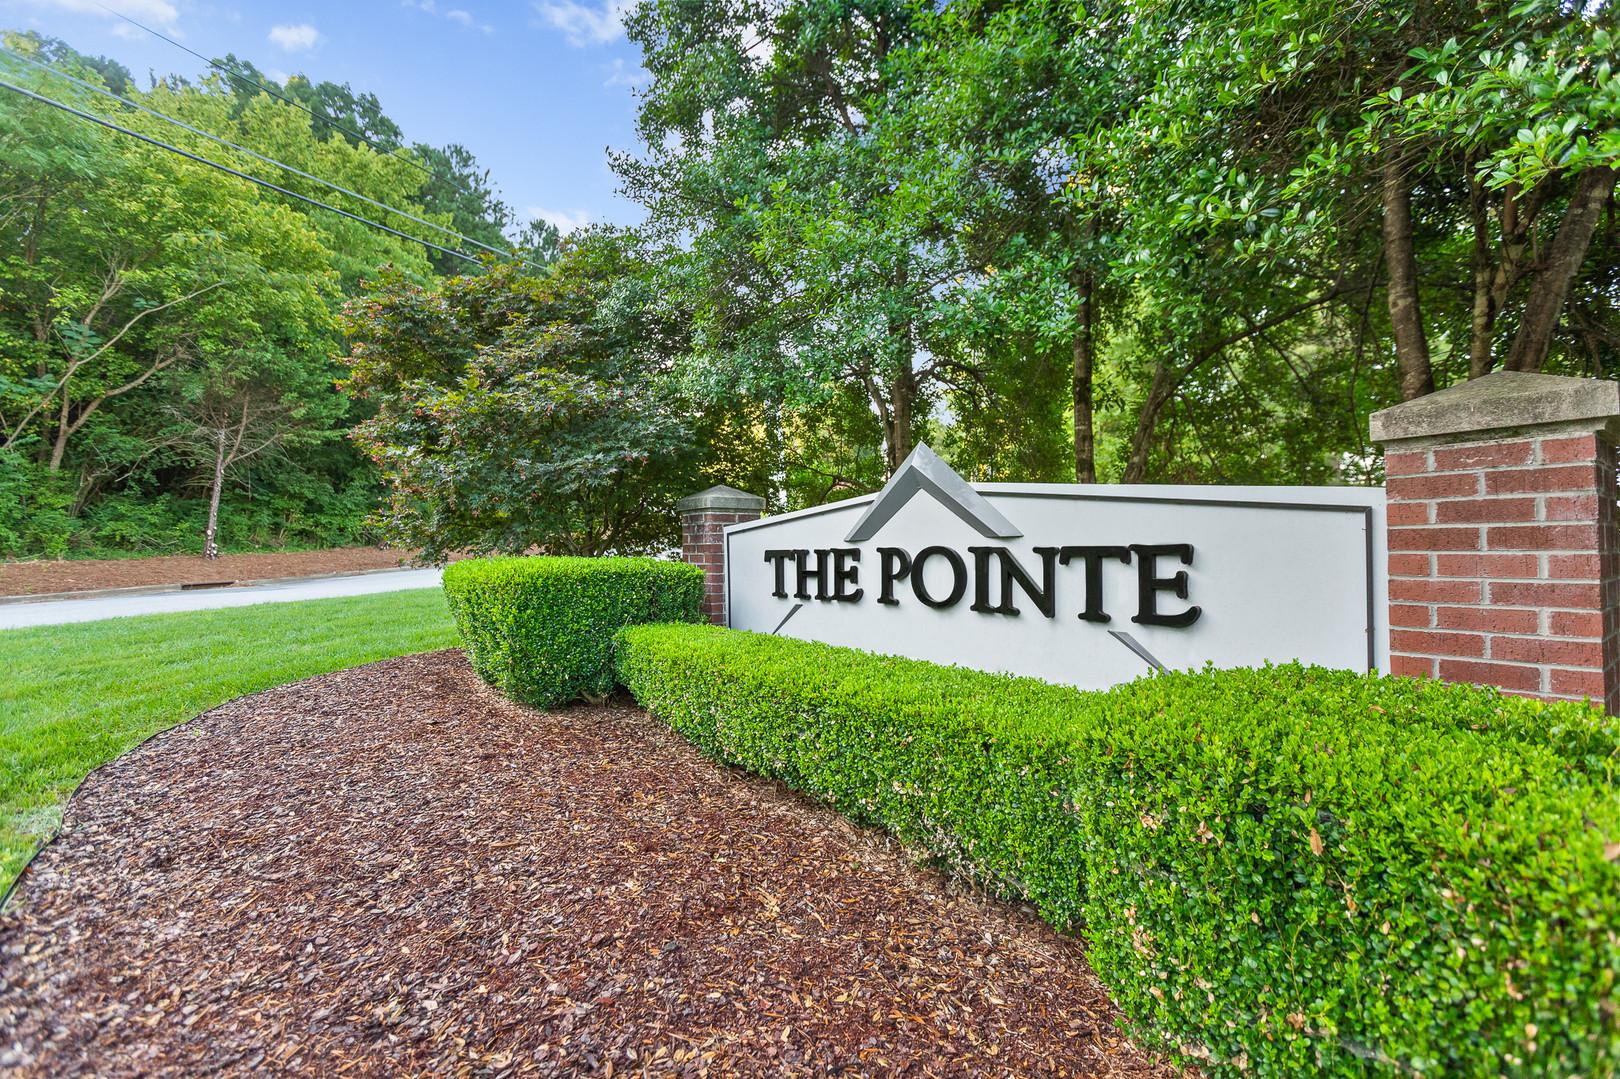 The Pointe Centre